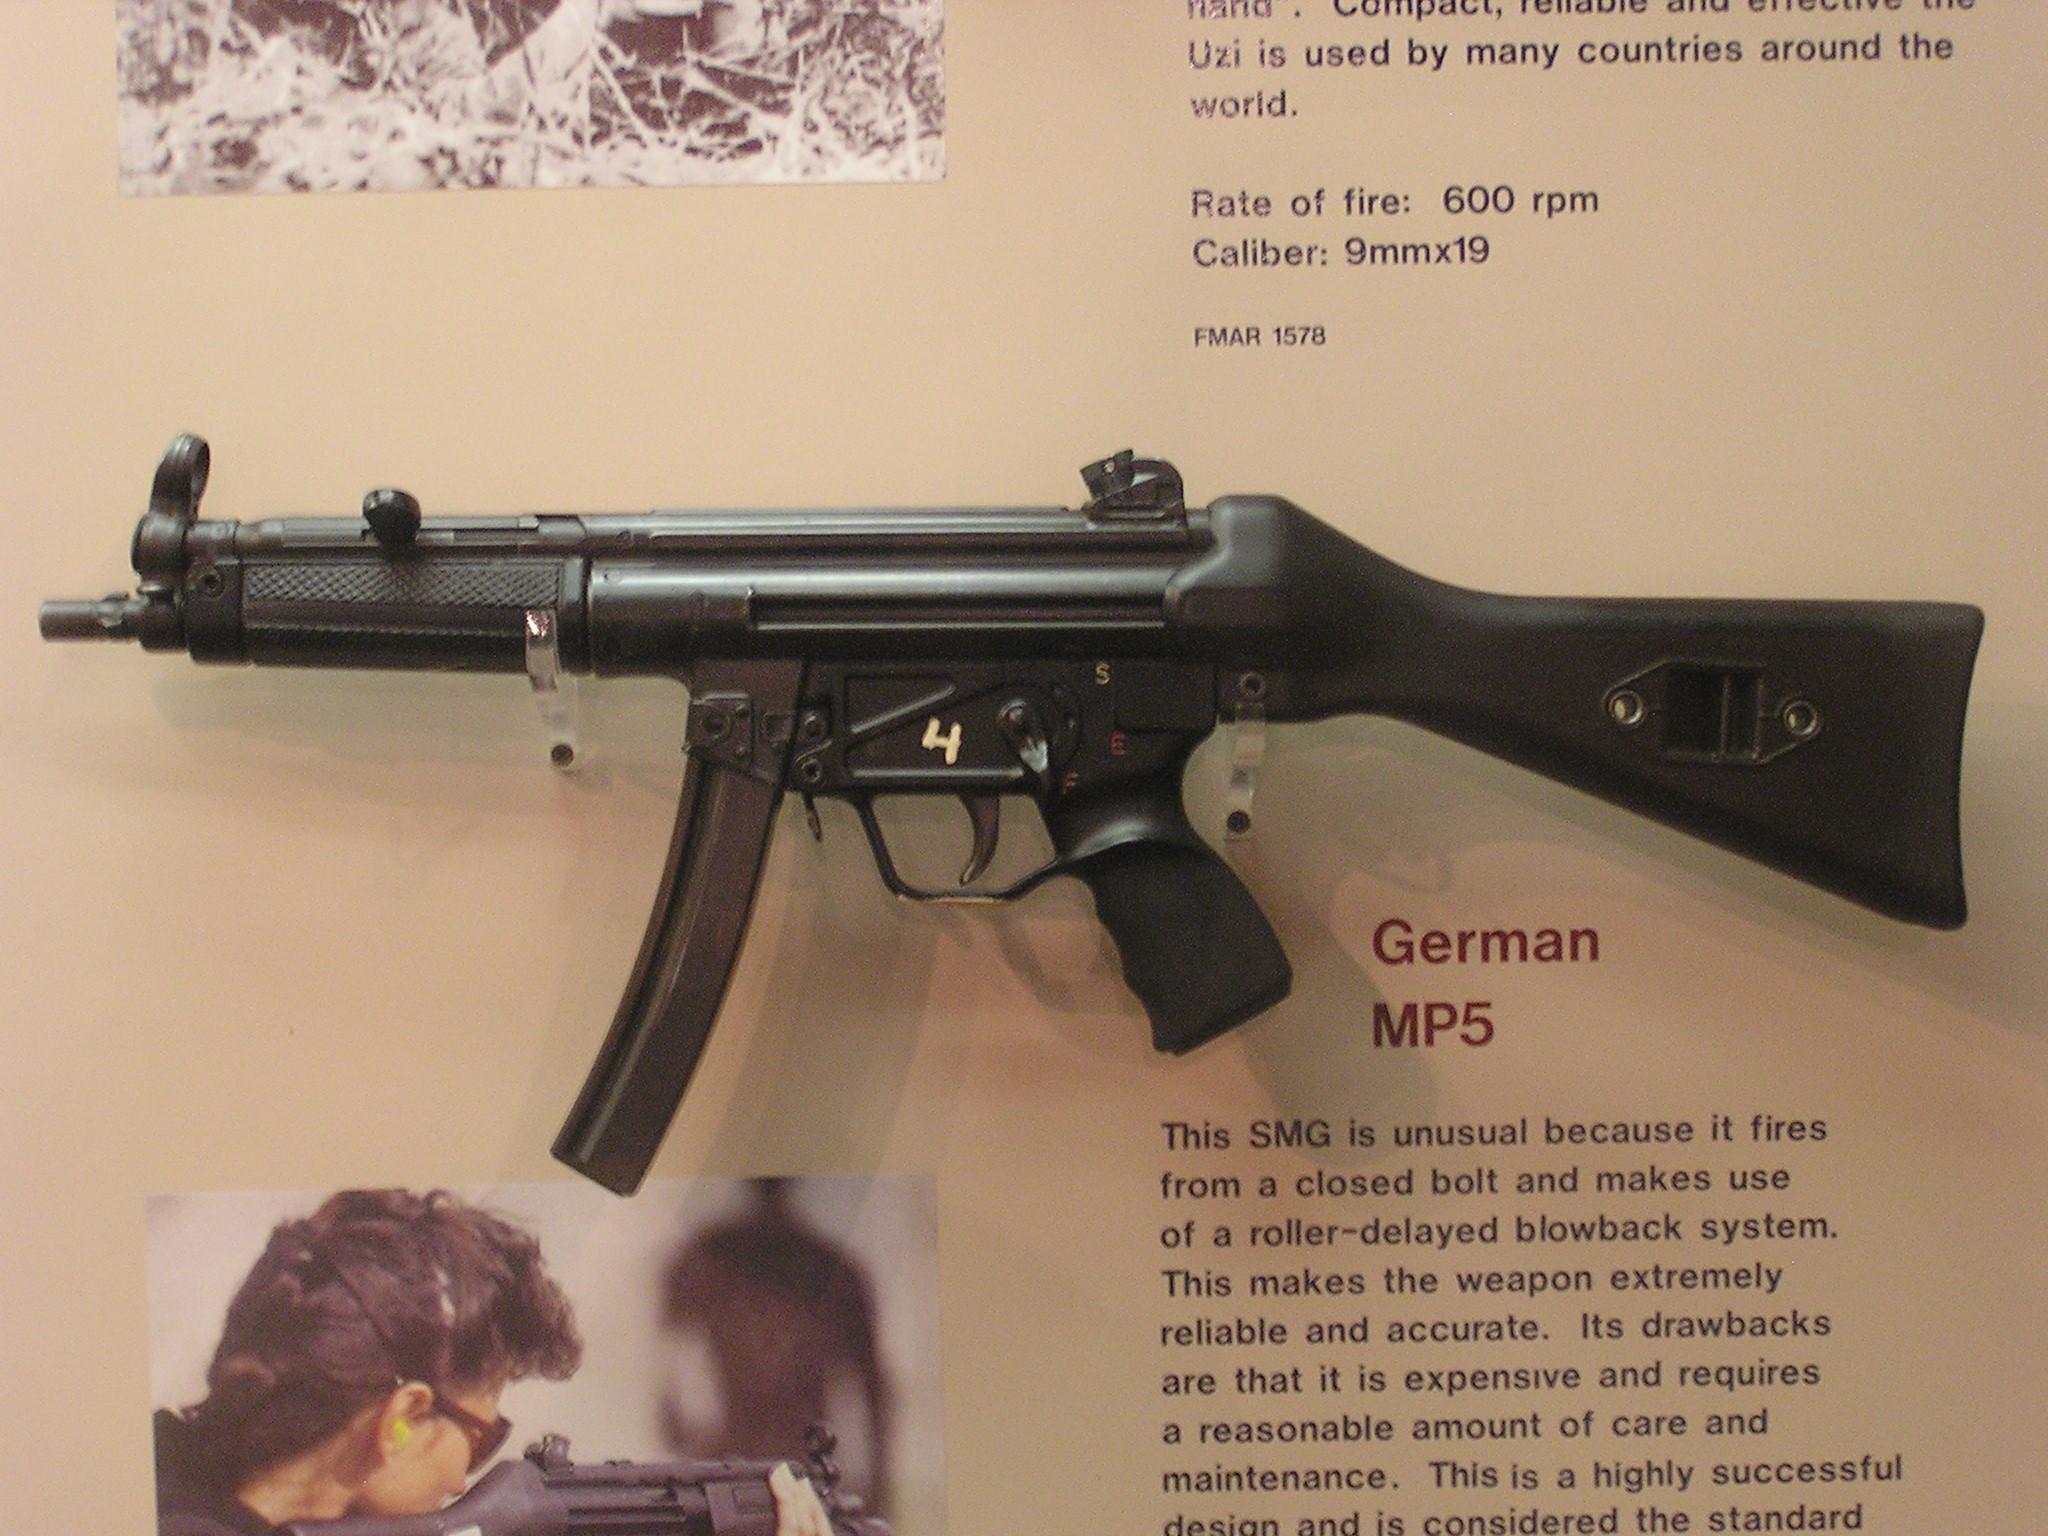 Image:MP5 in U.S. Ordnance Museum